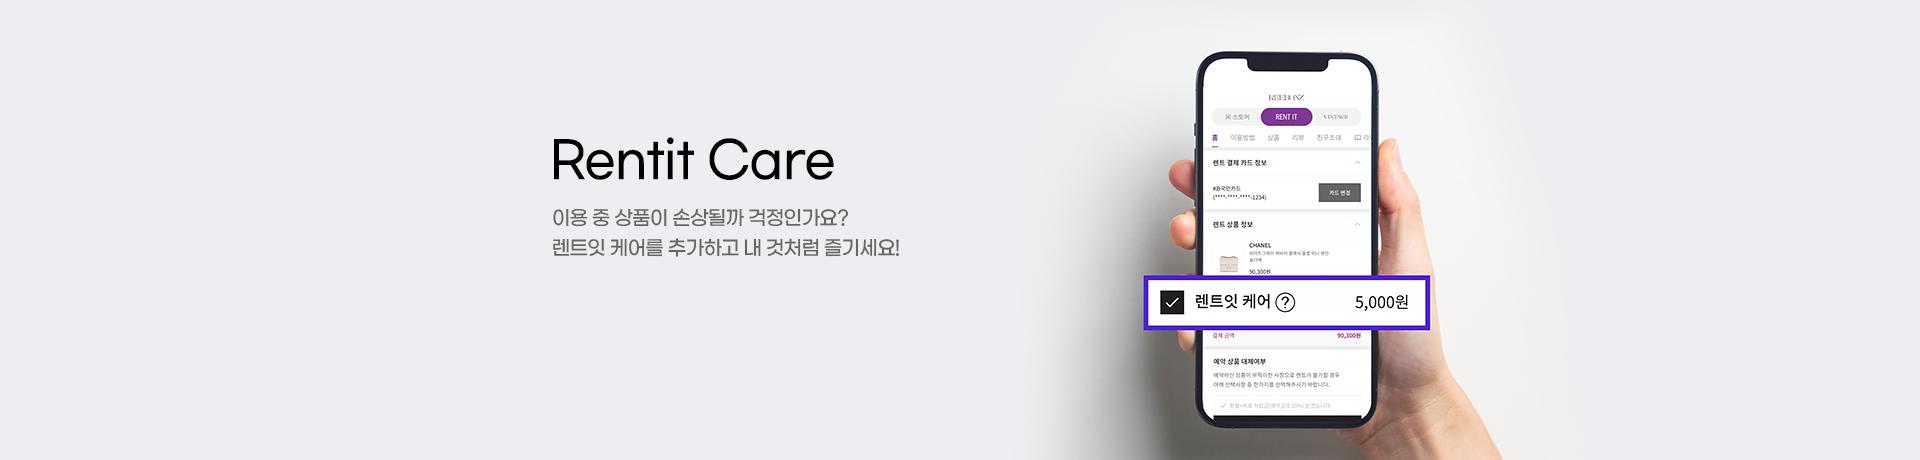 210830_sj_rentit_care_pc-_edeef1